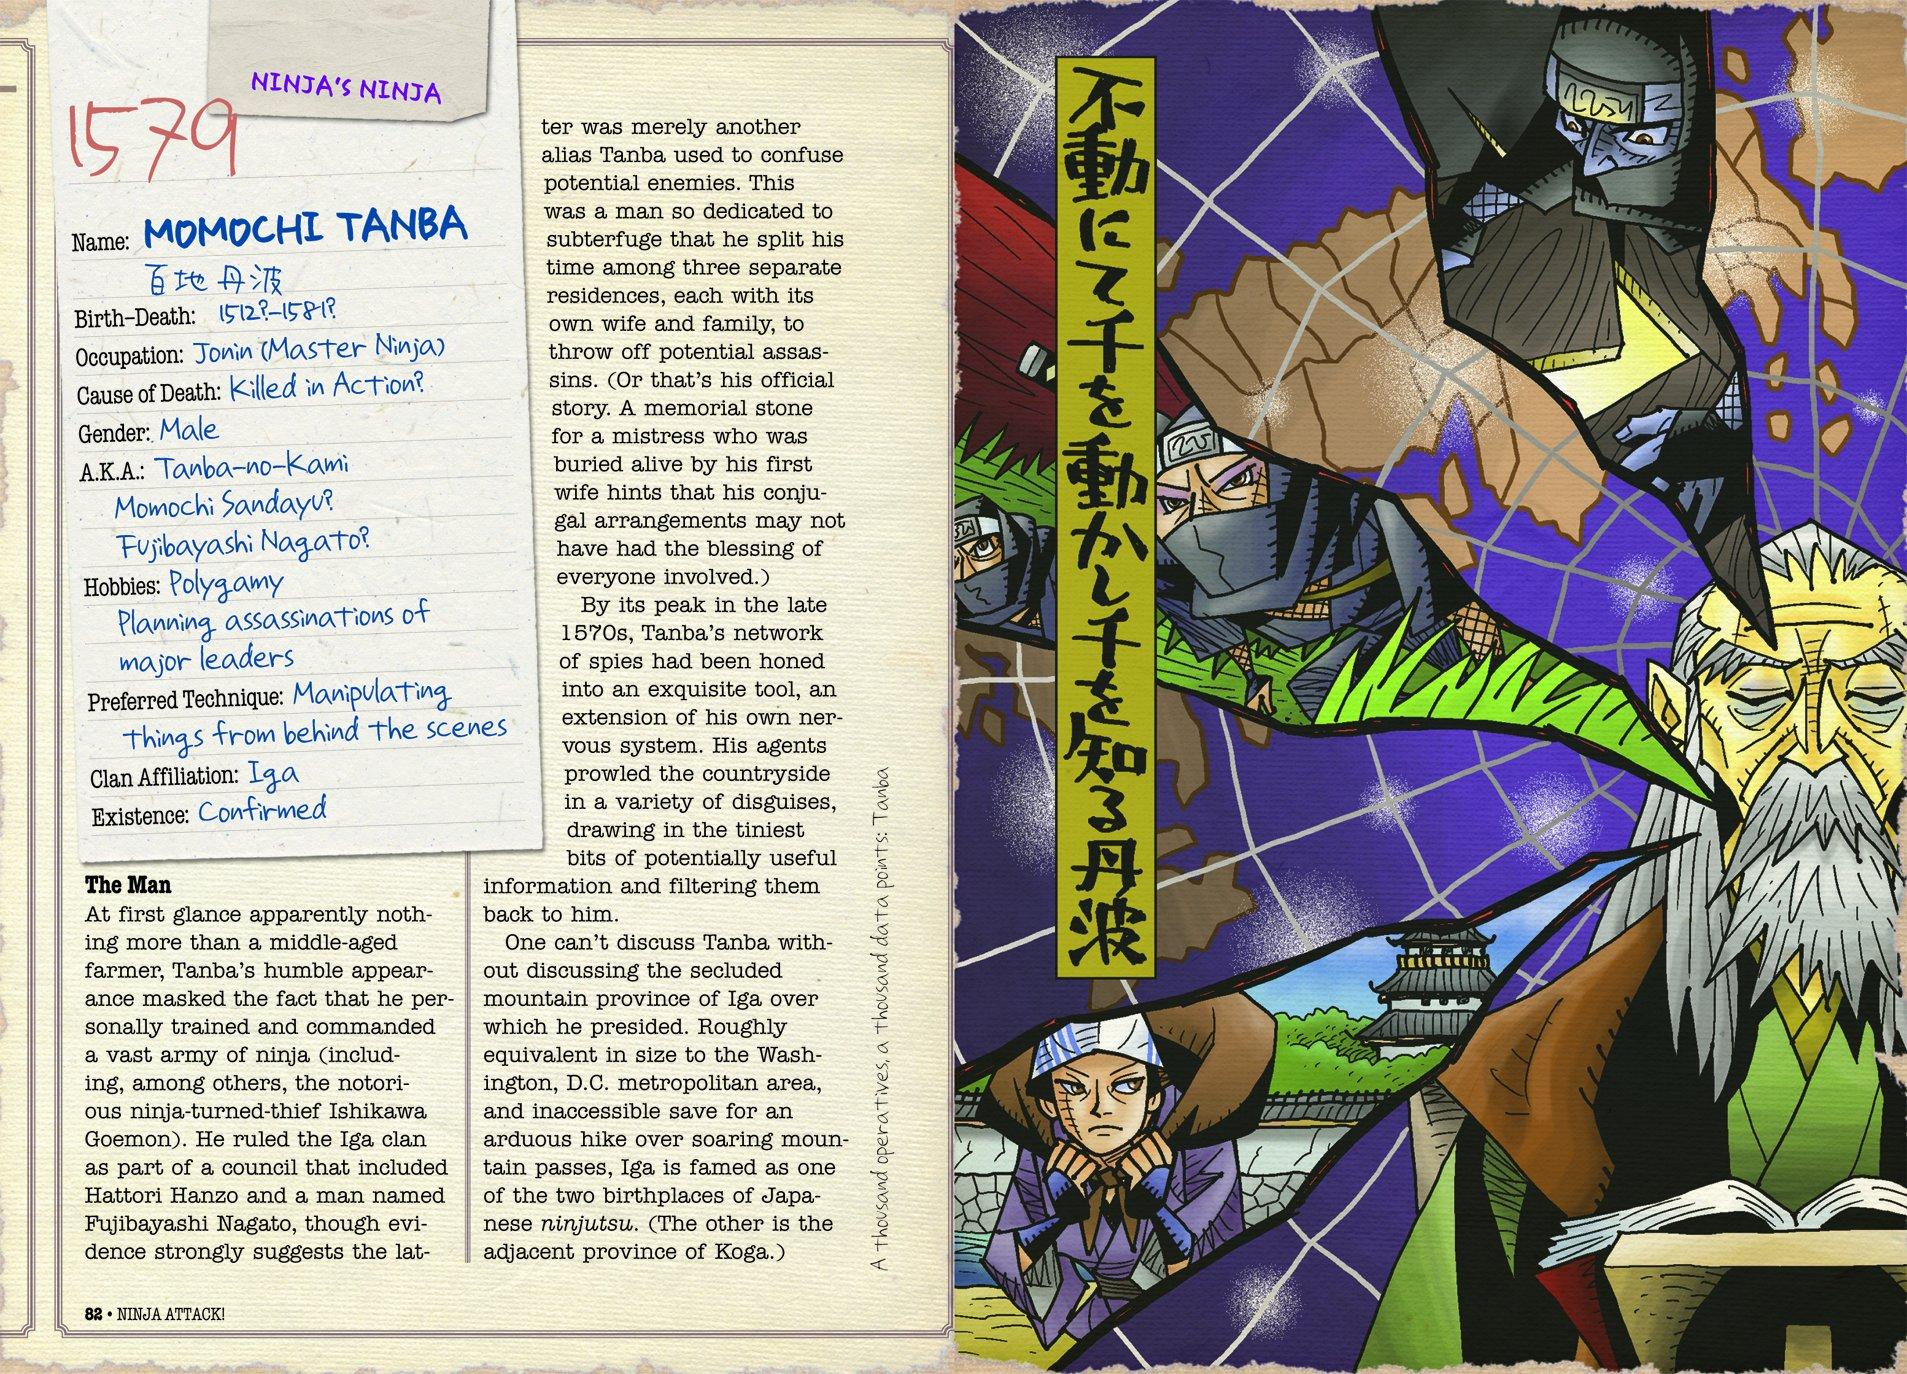 Ninja Attack!: True Tales of Assassins, Samurai, and Outlaws ...